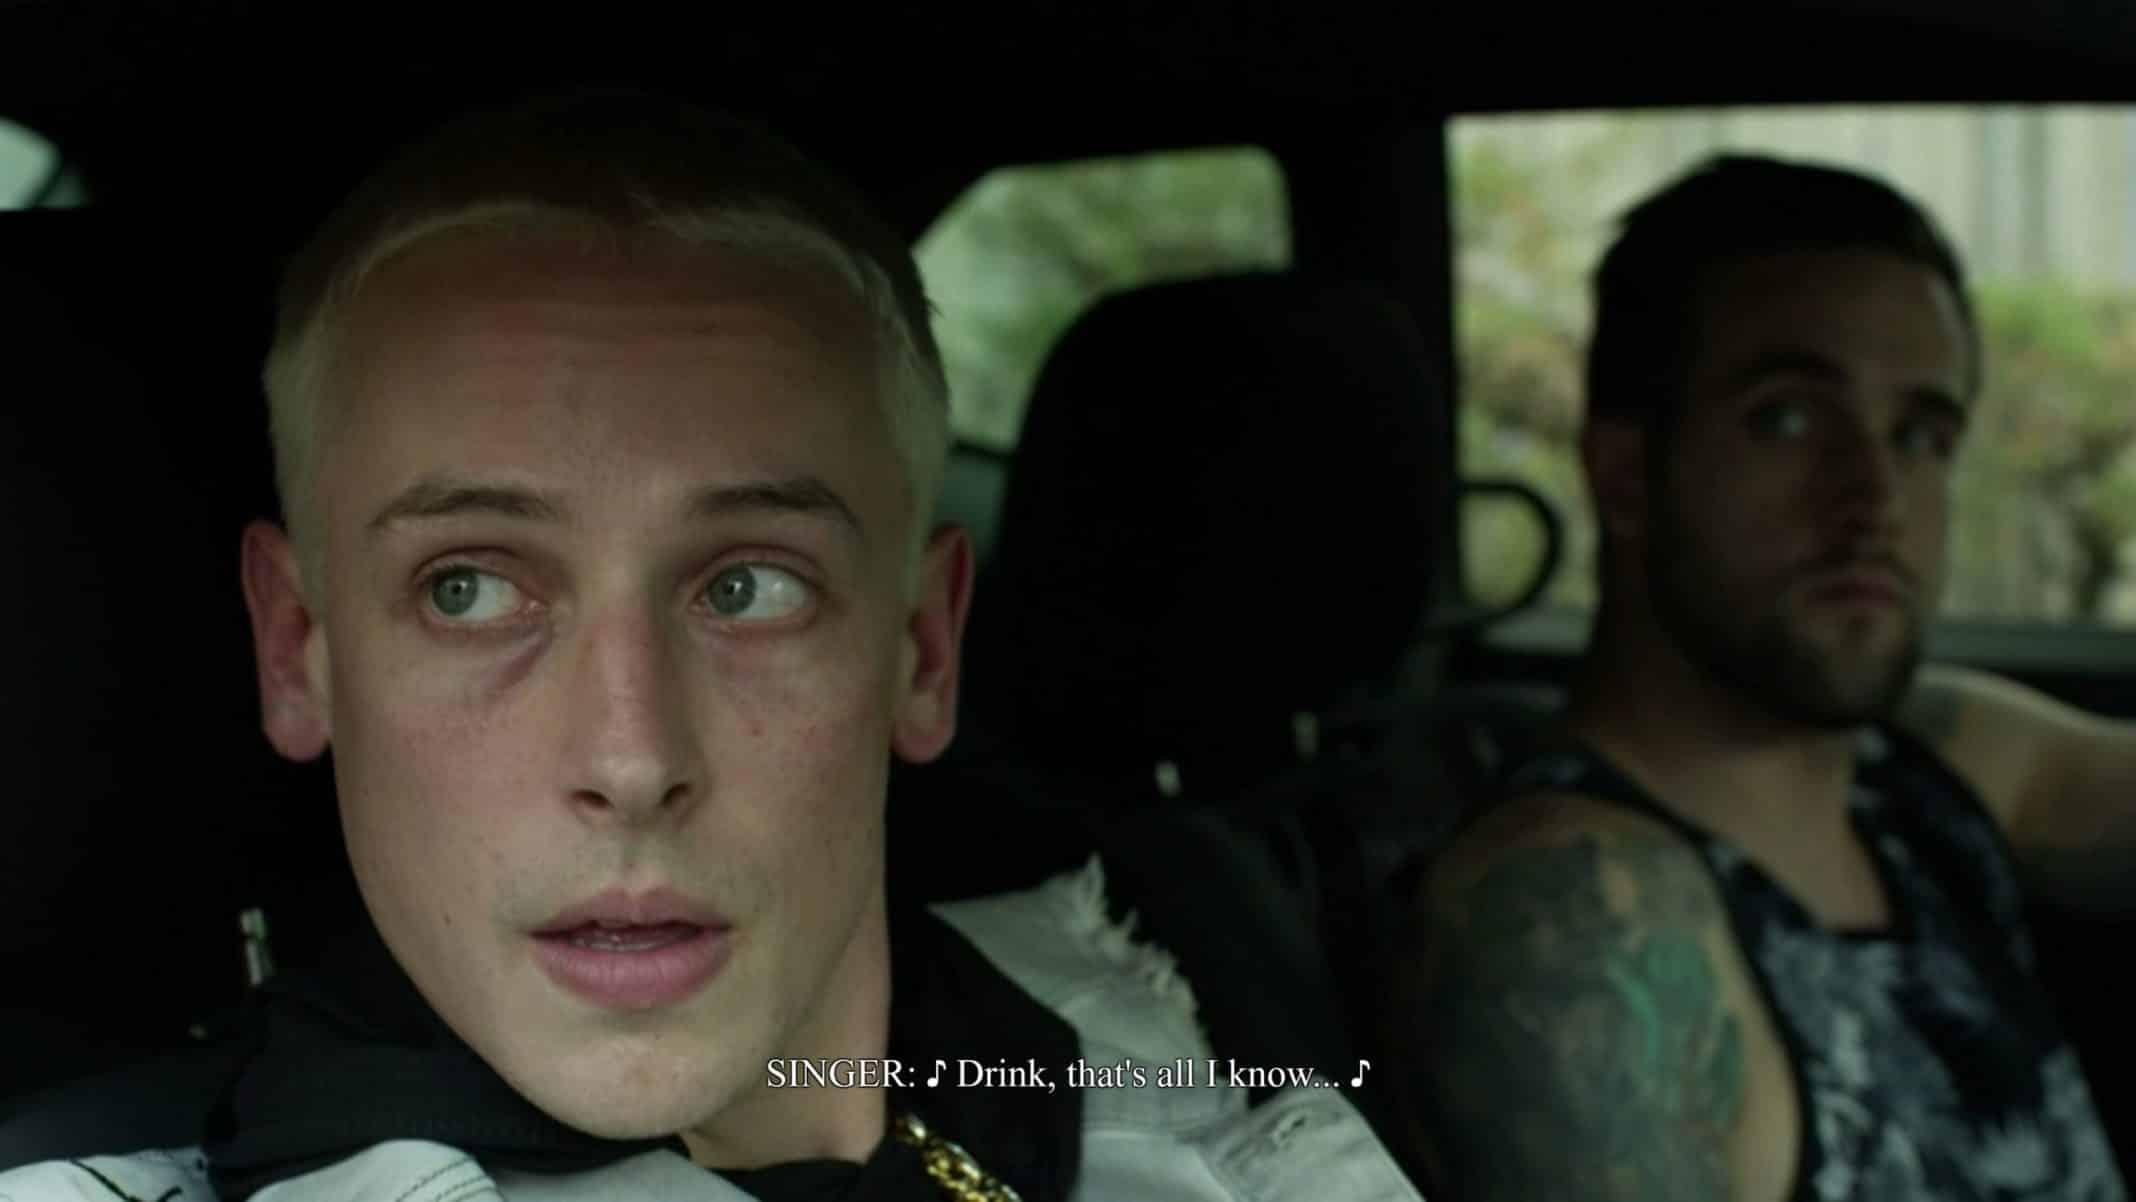 Kizzle (Edumund Donovan) in a car talking to Junior.